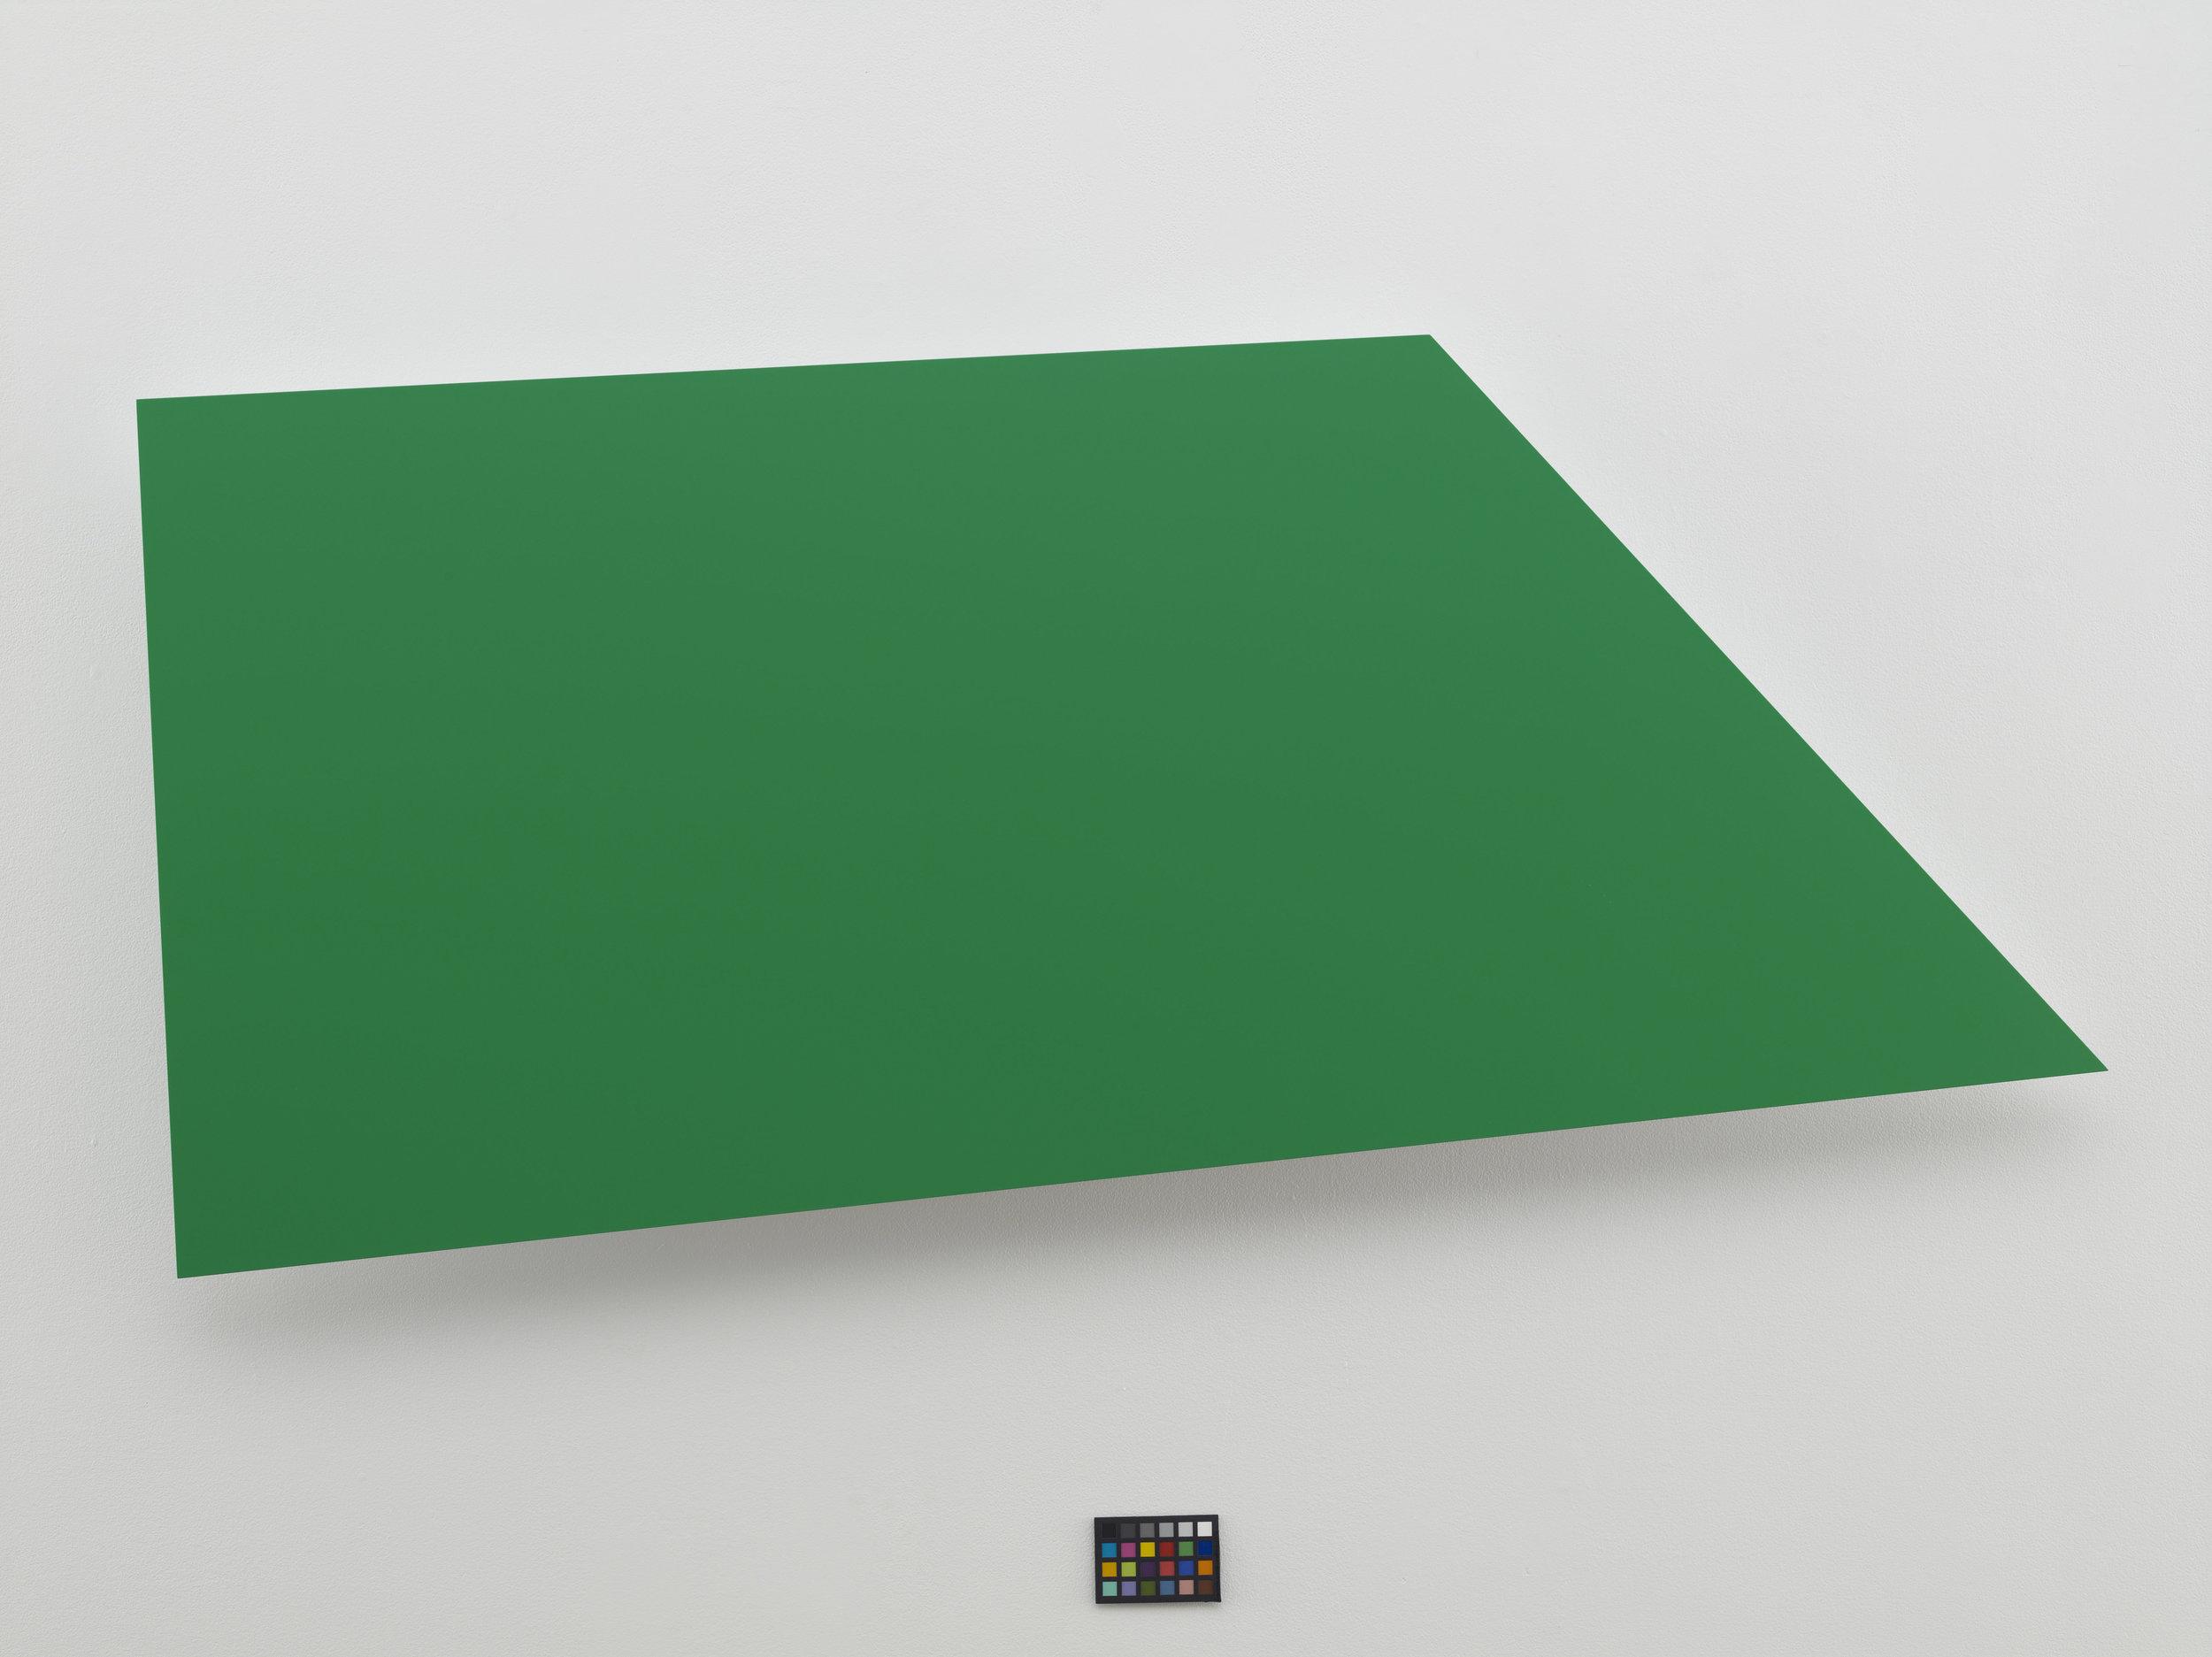 Ellsworth Kelly  Green Panel (EK1022)  Painted aluminum  22.25 x 49.5 x 22.25 x 49.5 inches      View More Ellsworth Kelly